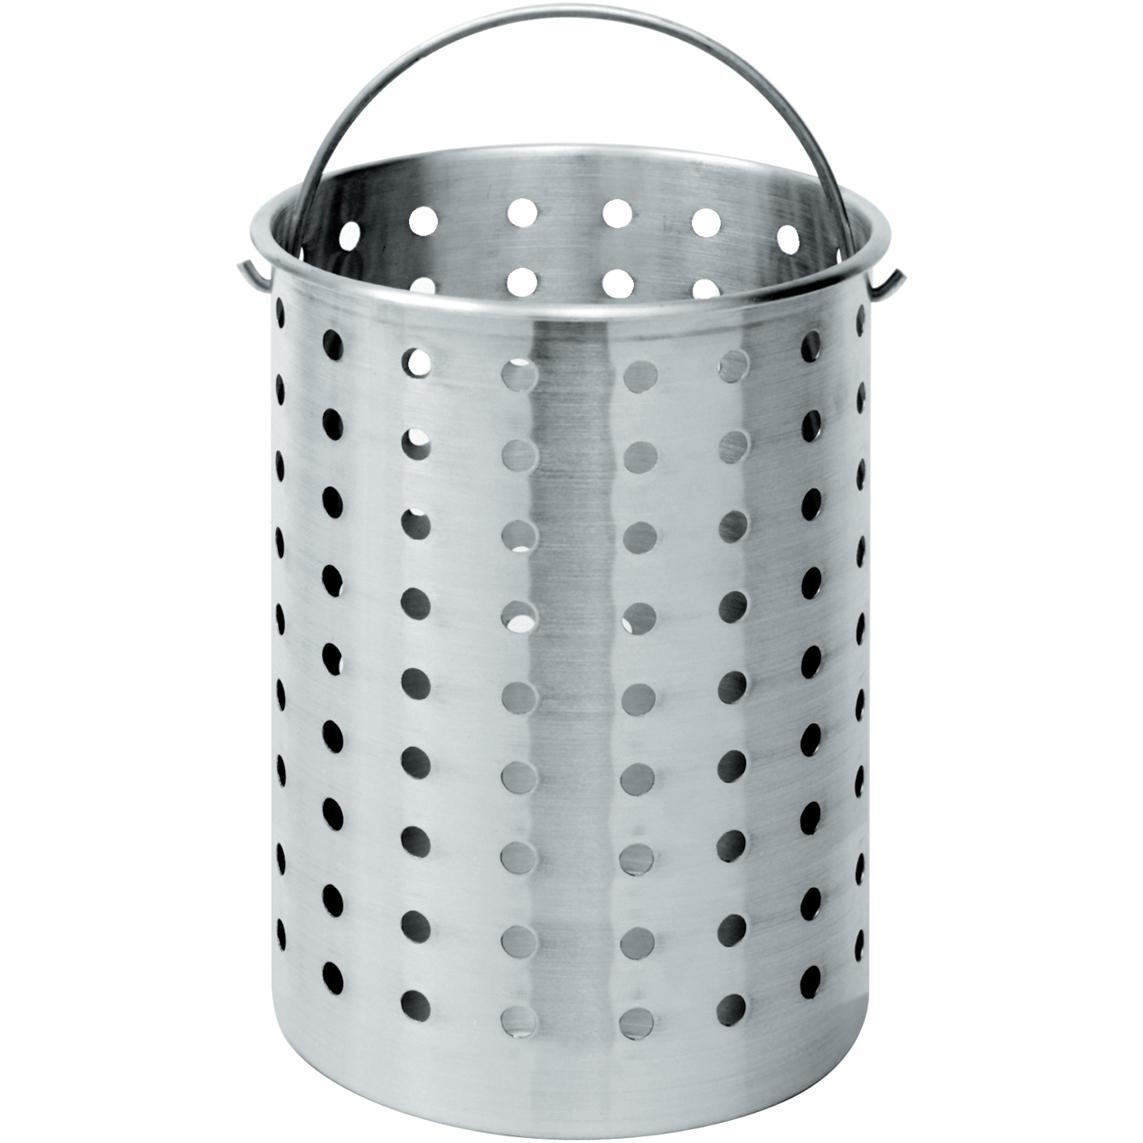 26 - 30 Qt. Turkey Fryer Basket